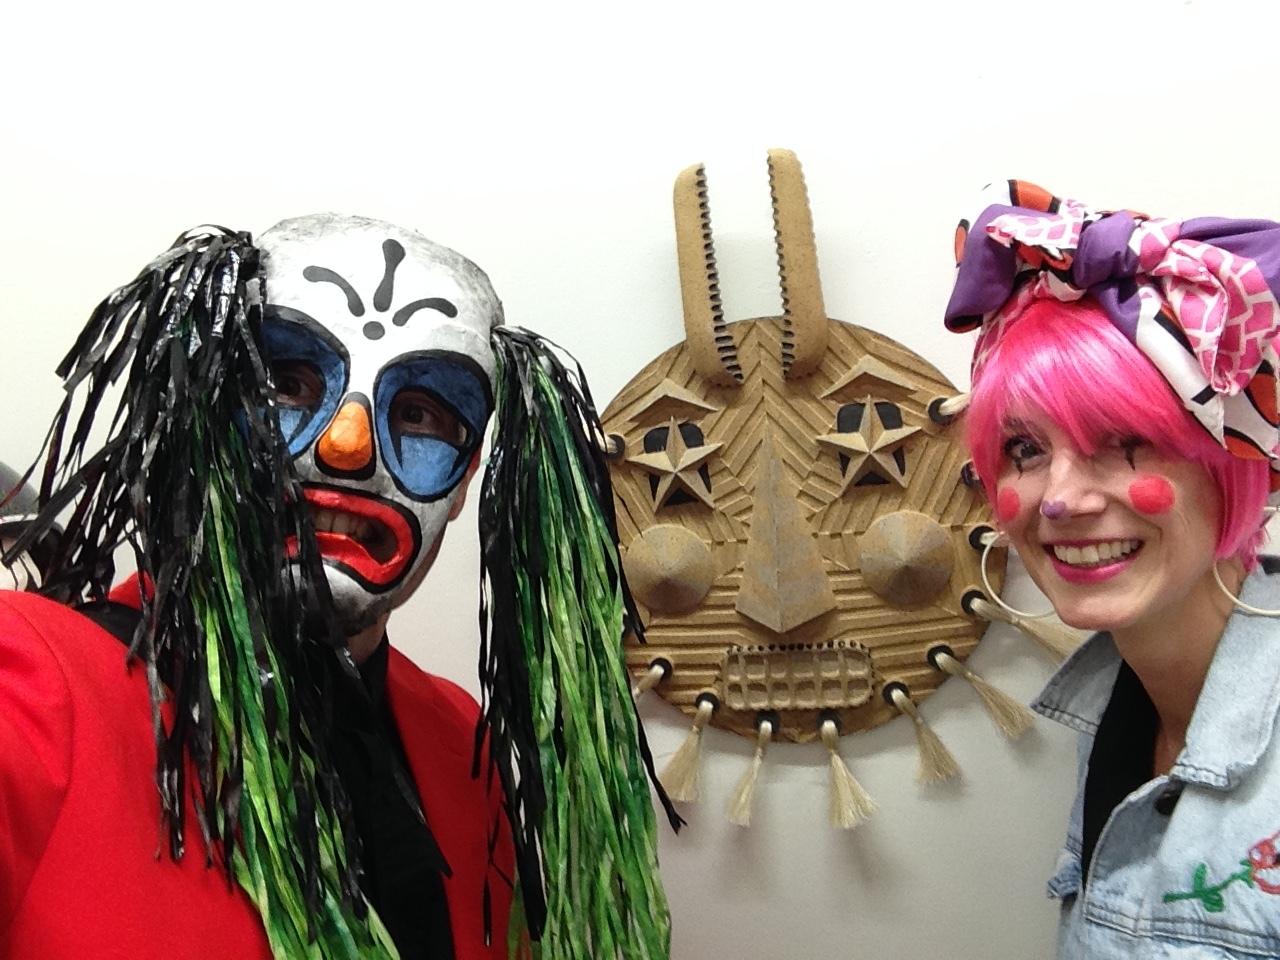 With Nashville ceramics artist Keavy Murphree